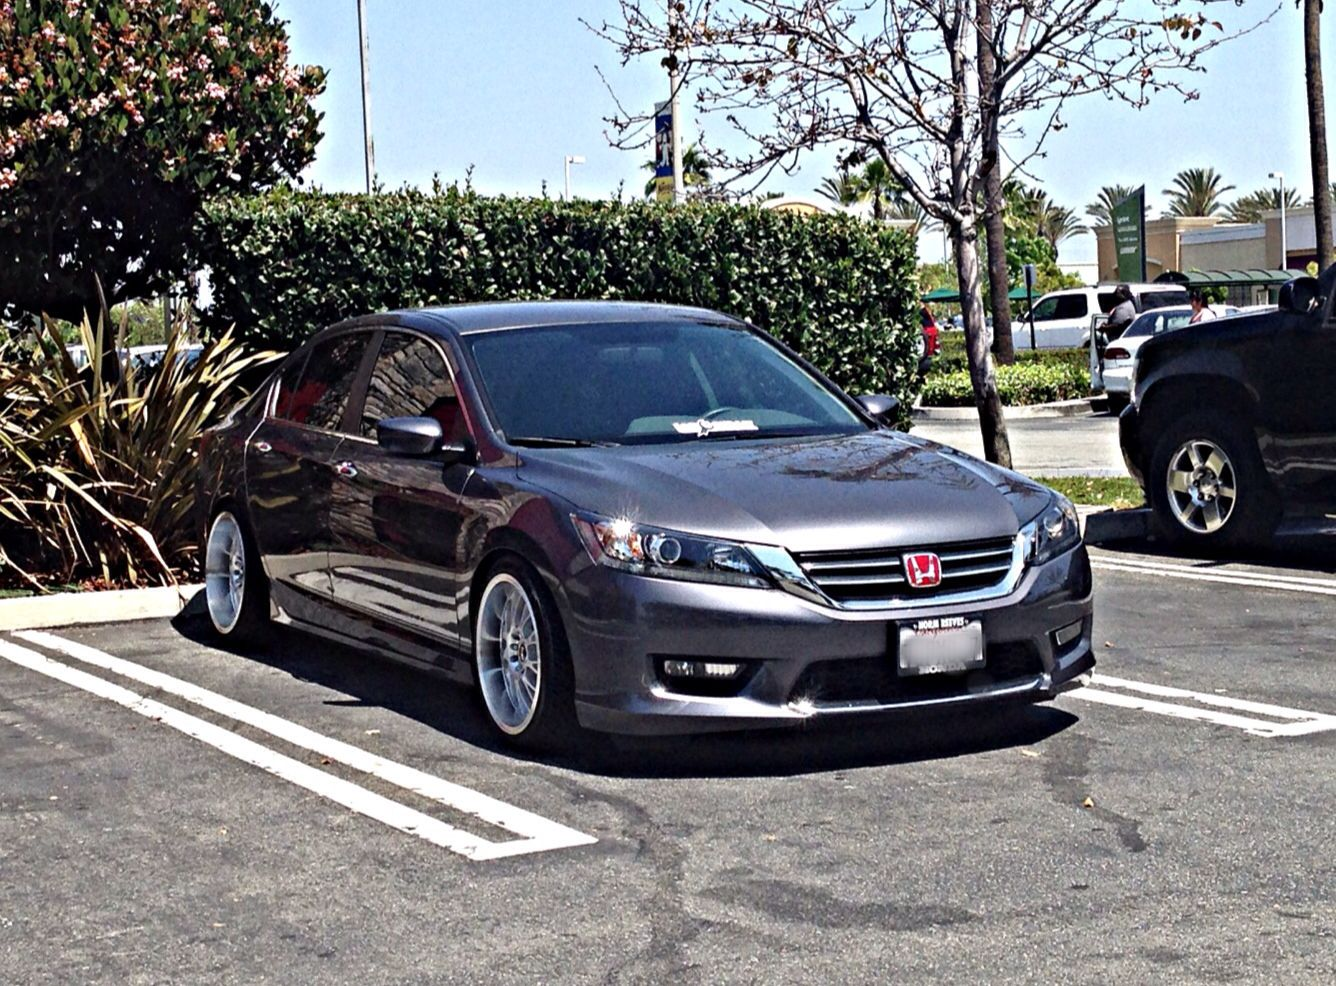 My very own,2014 accord sport sedan.. Now sitting on